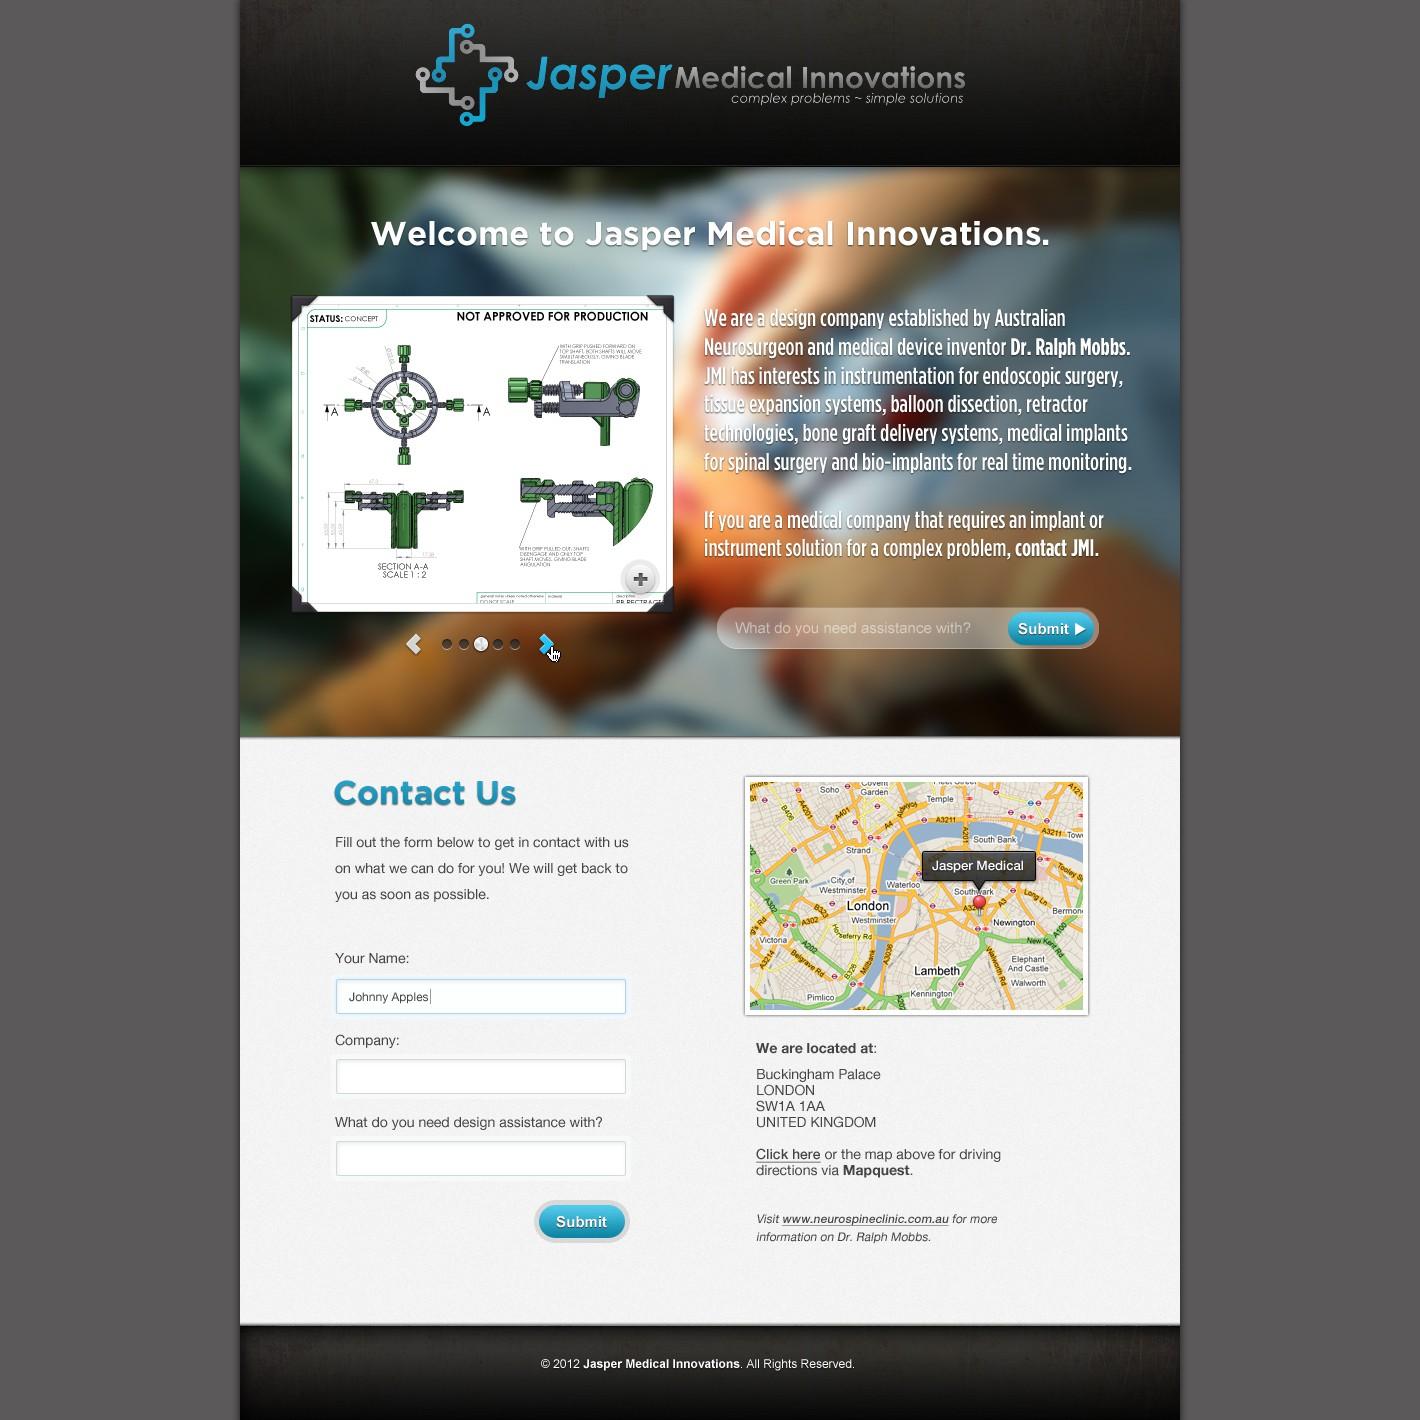 Create the next website design for Jasper Medical Innovations